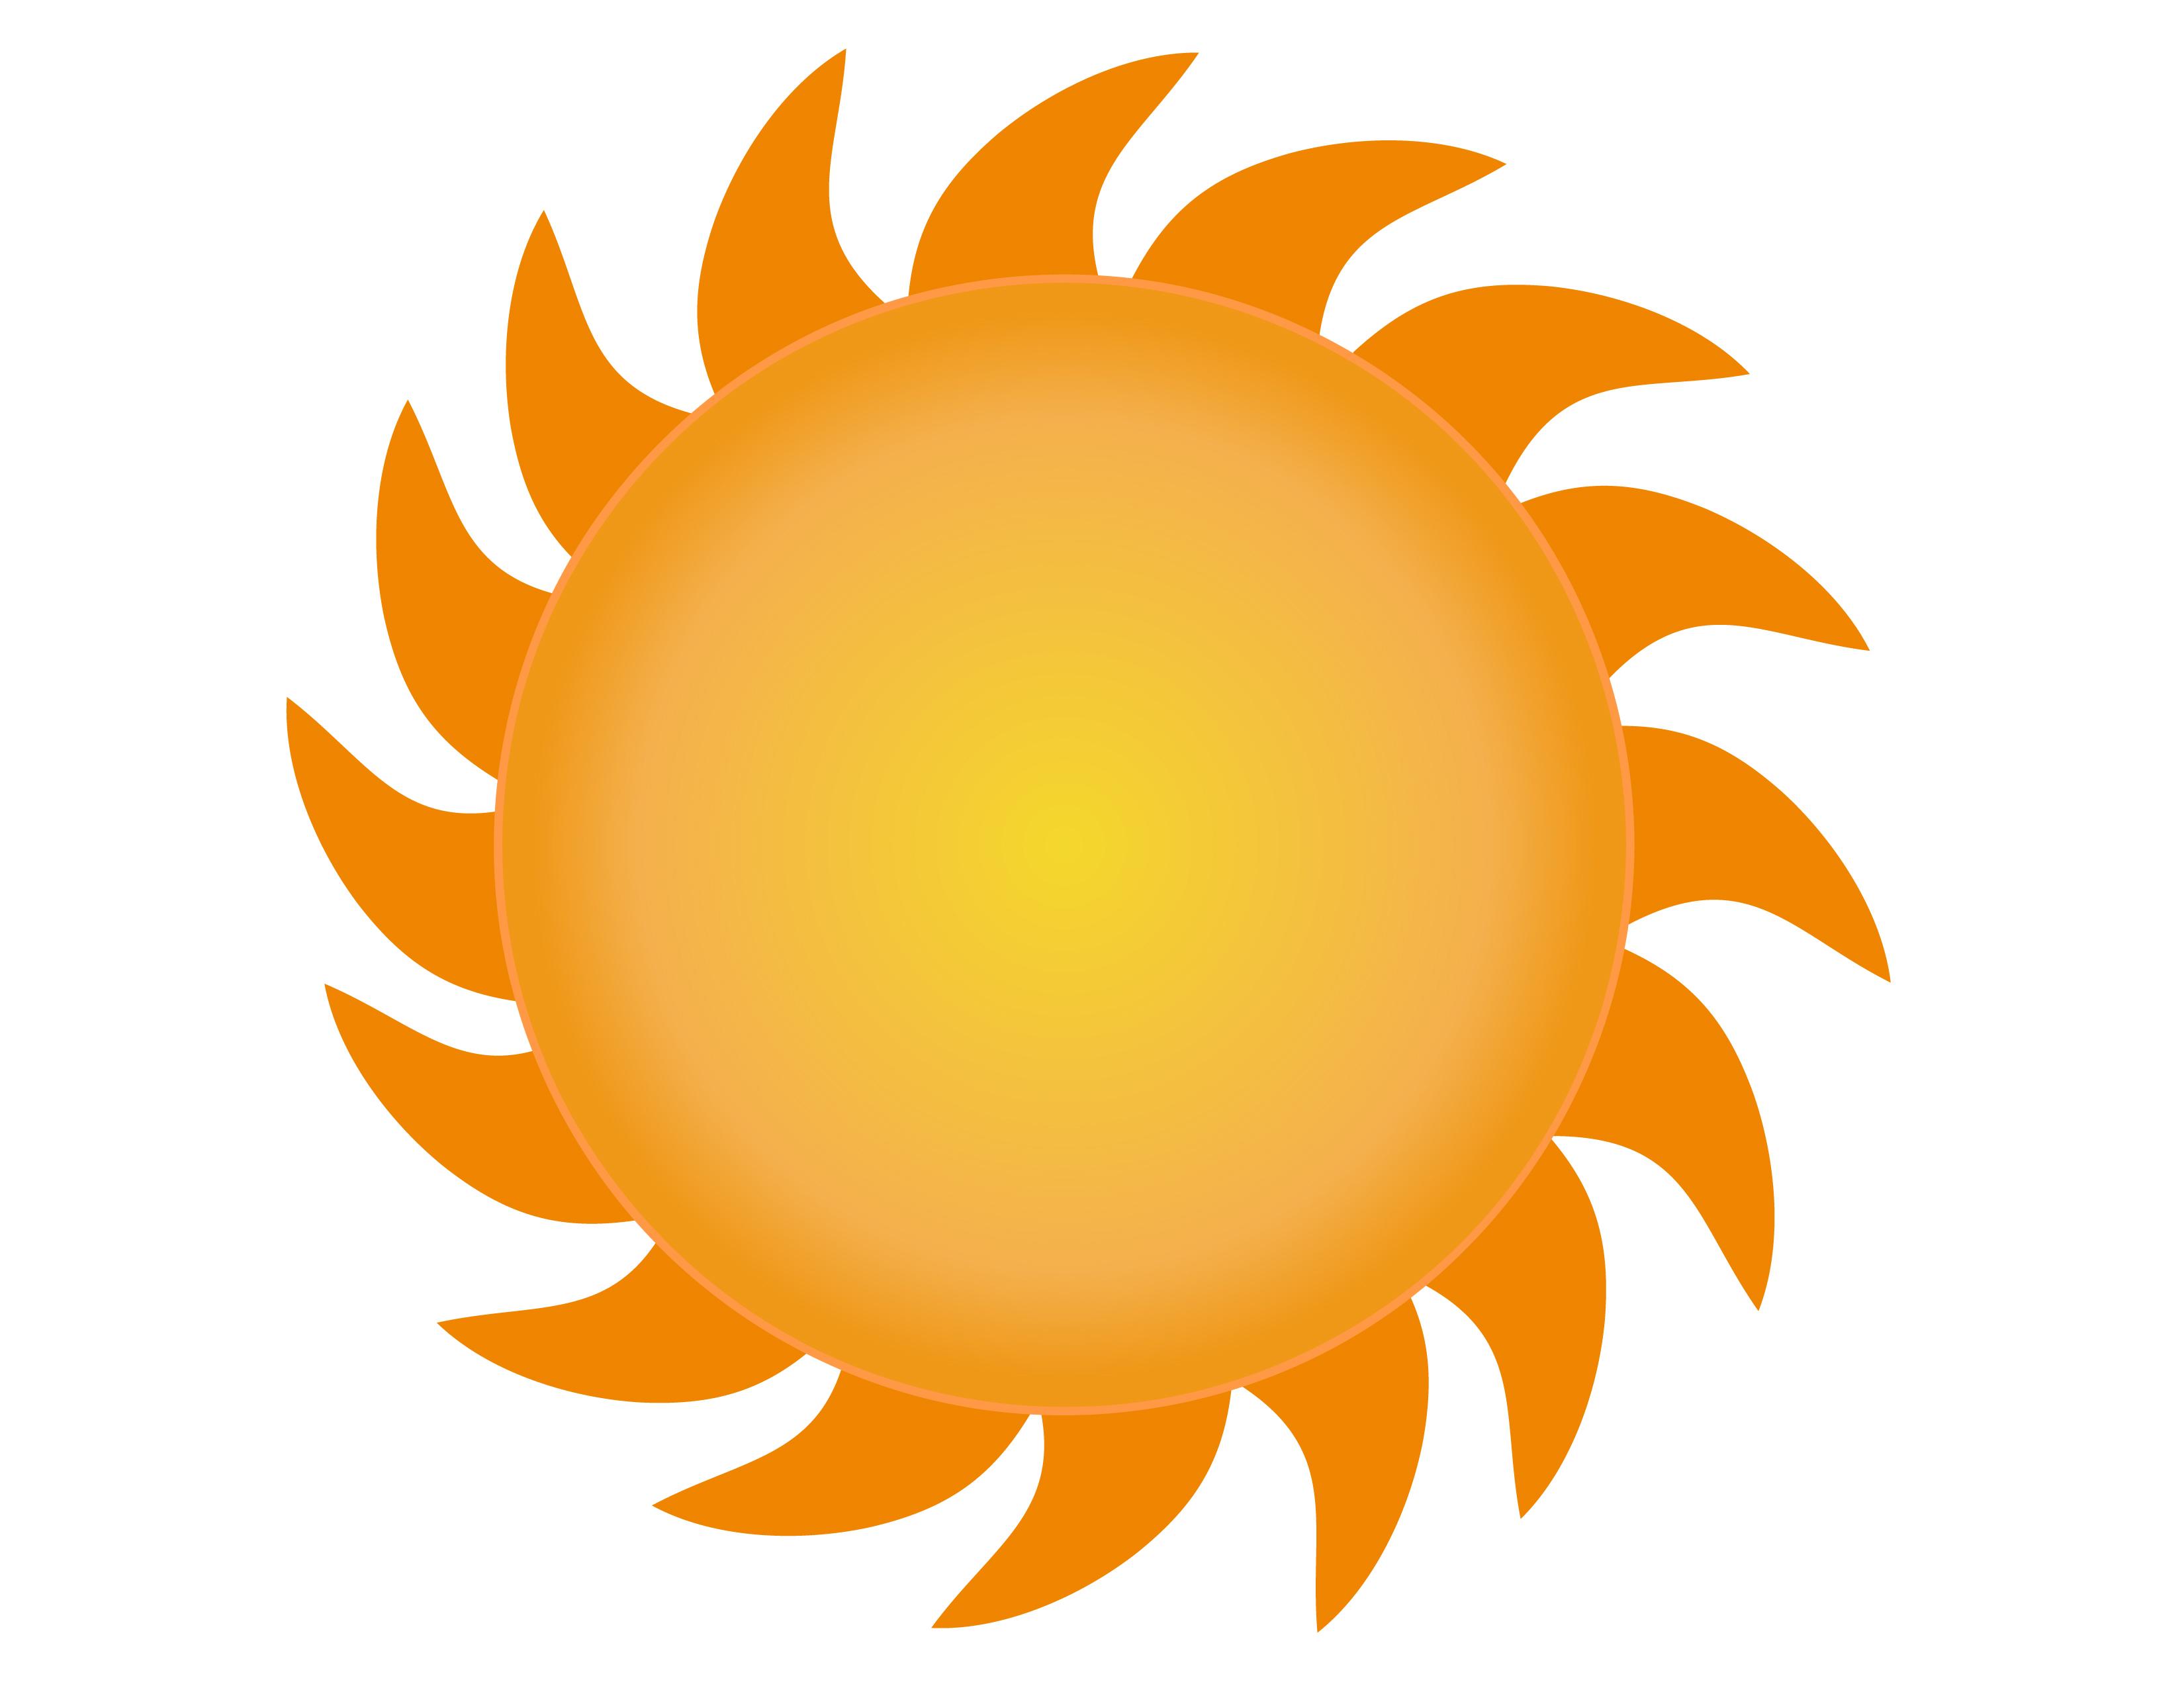 free sun vector clipart - Clipground